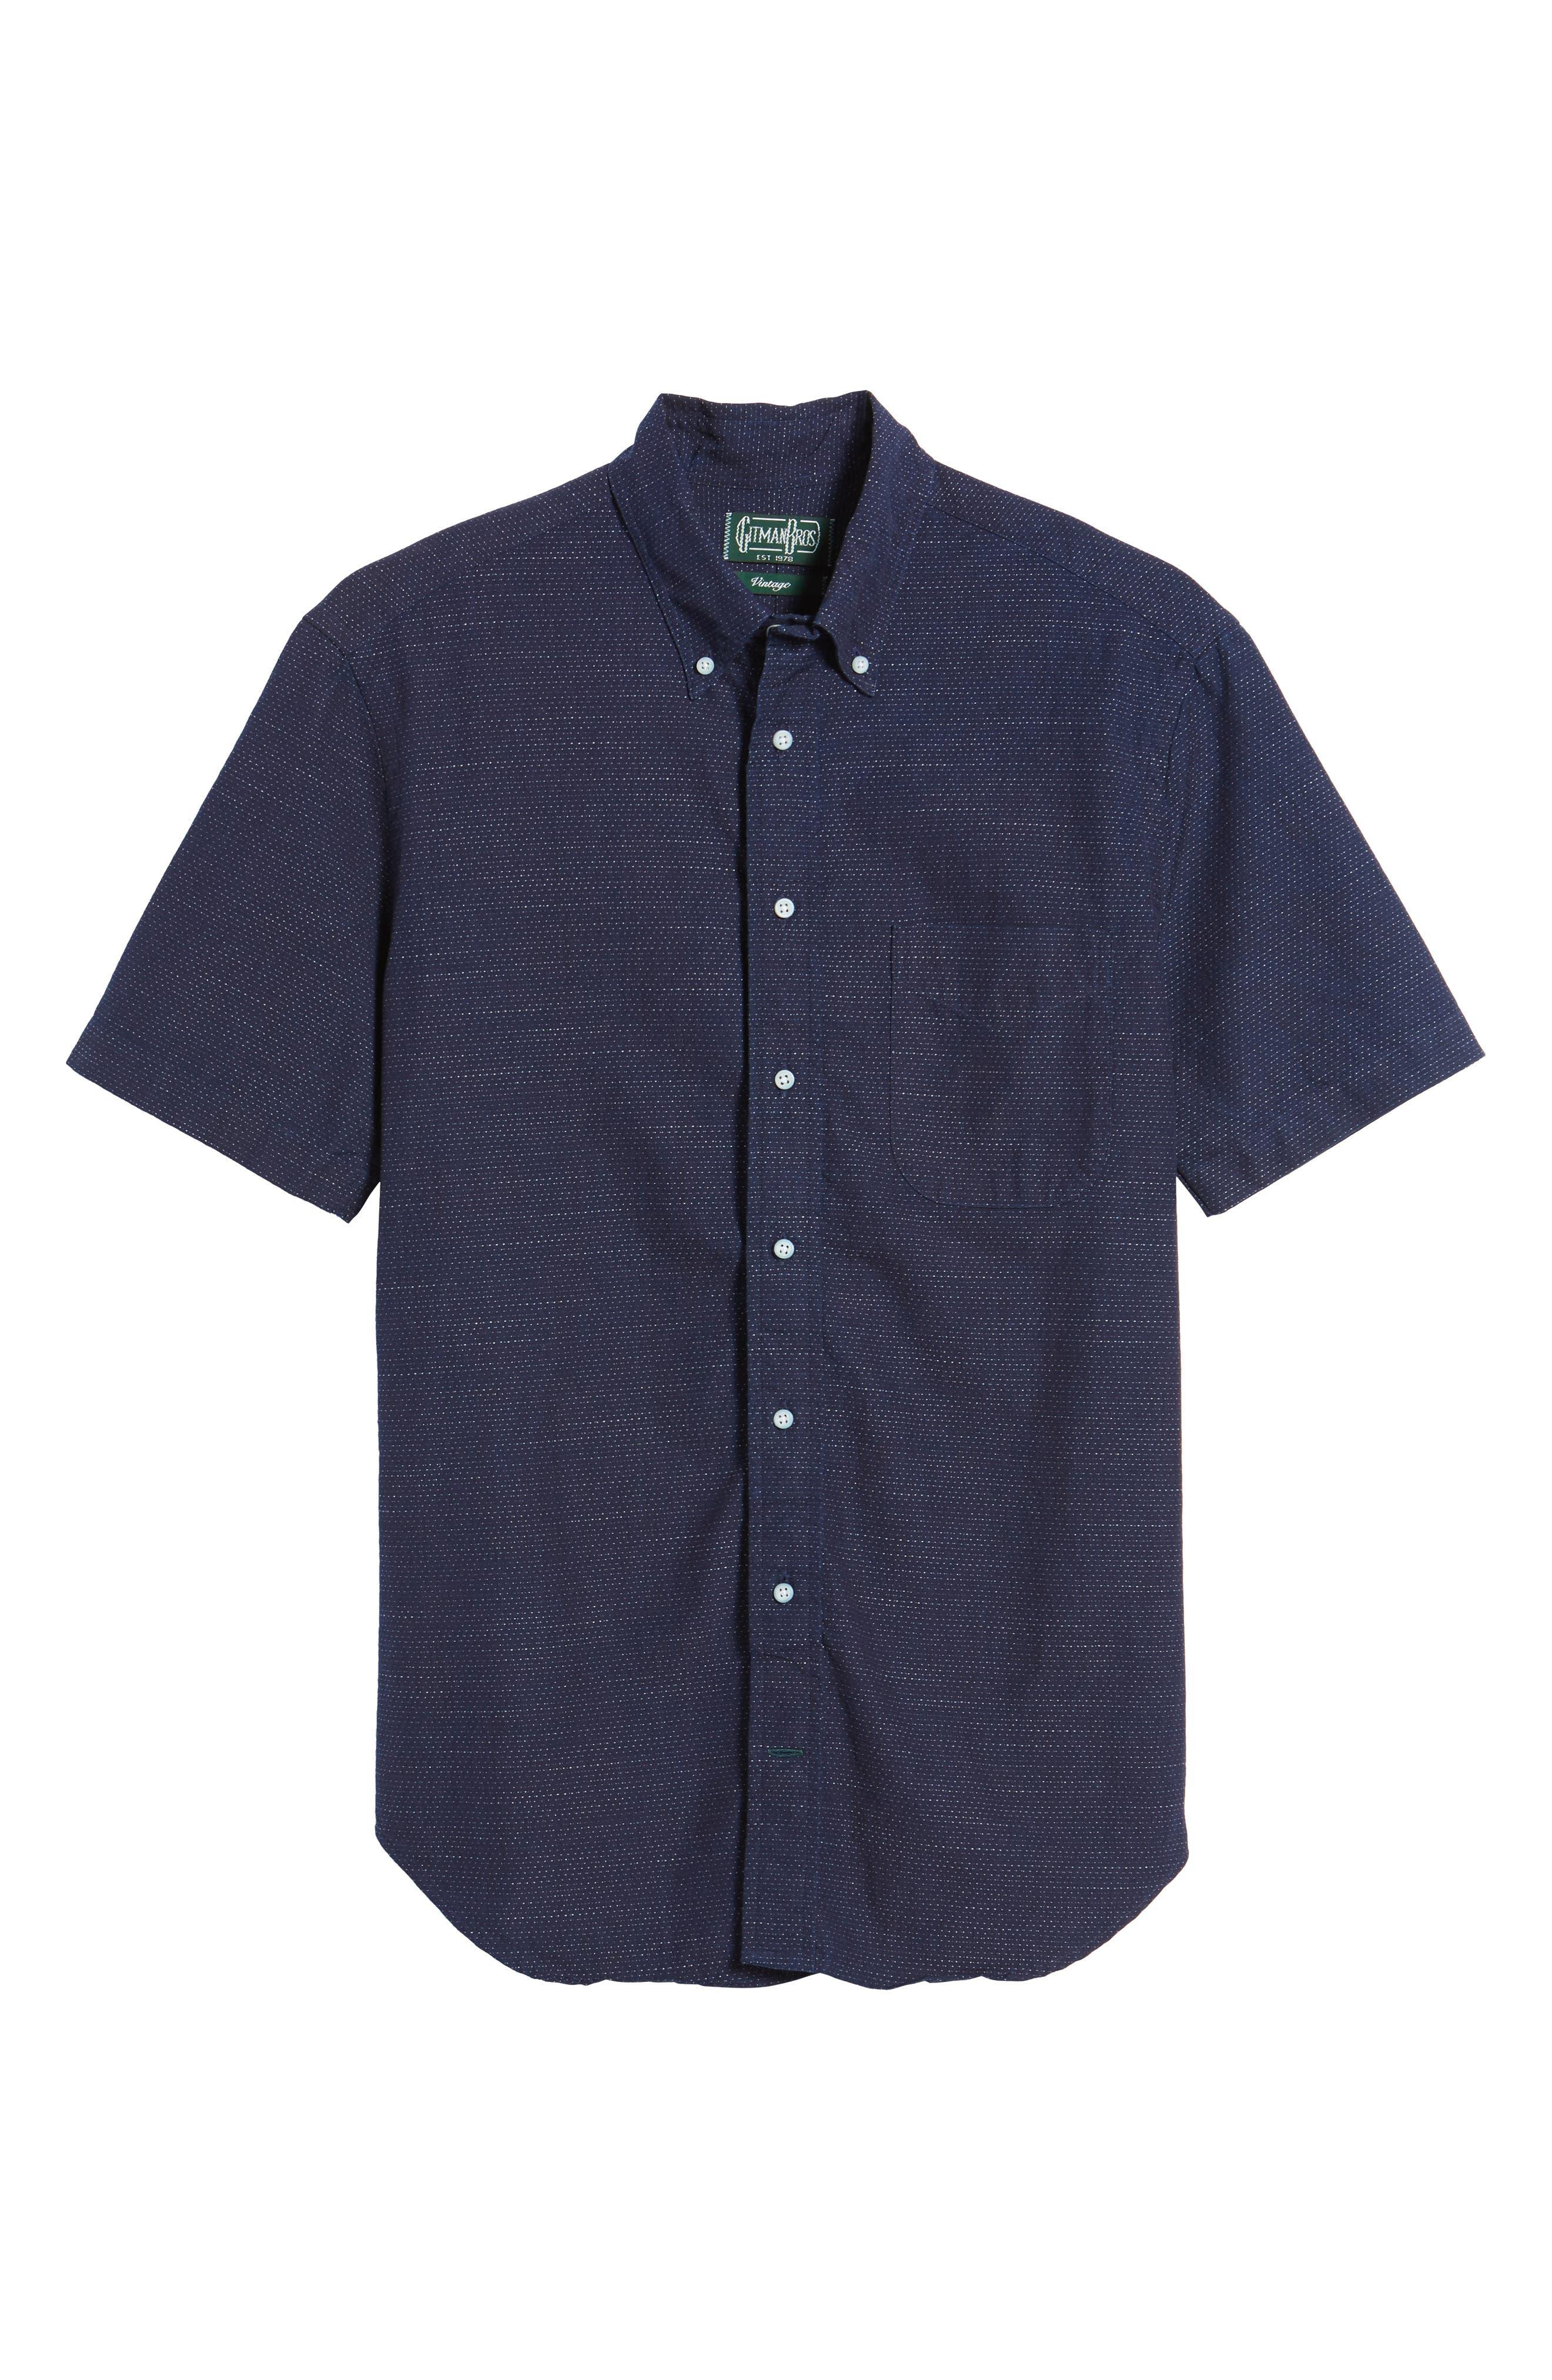 Camp Shirt,                             Alternate thumbnail 6, color,                             400